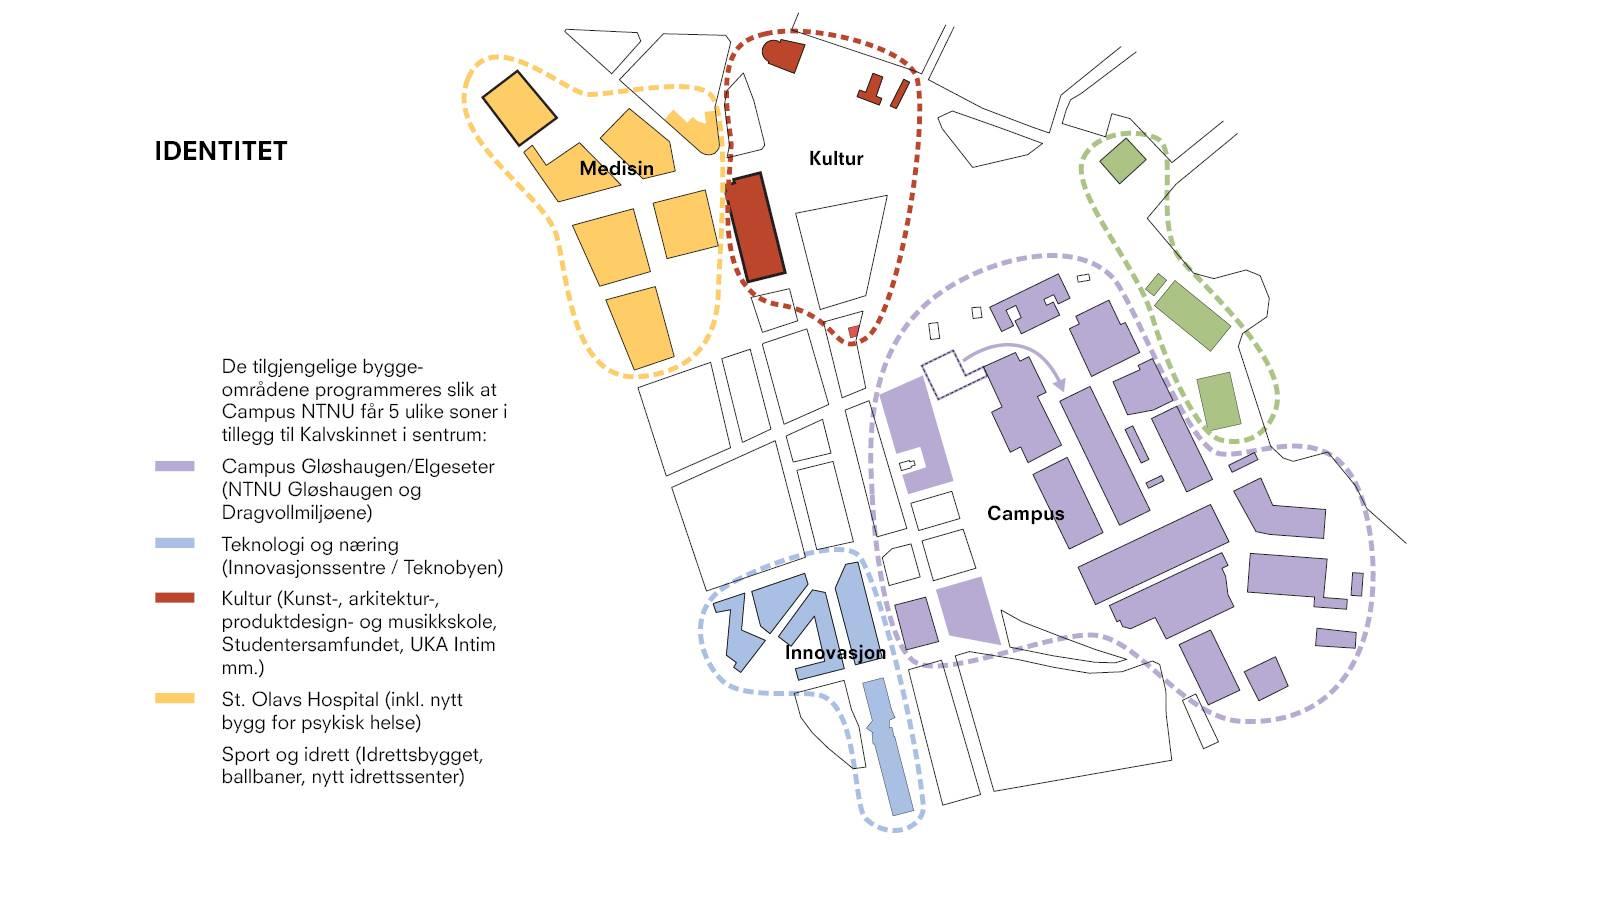 IDENTITIES - NTNU – More Park, More City! - SPOL Architects